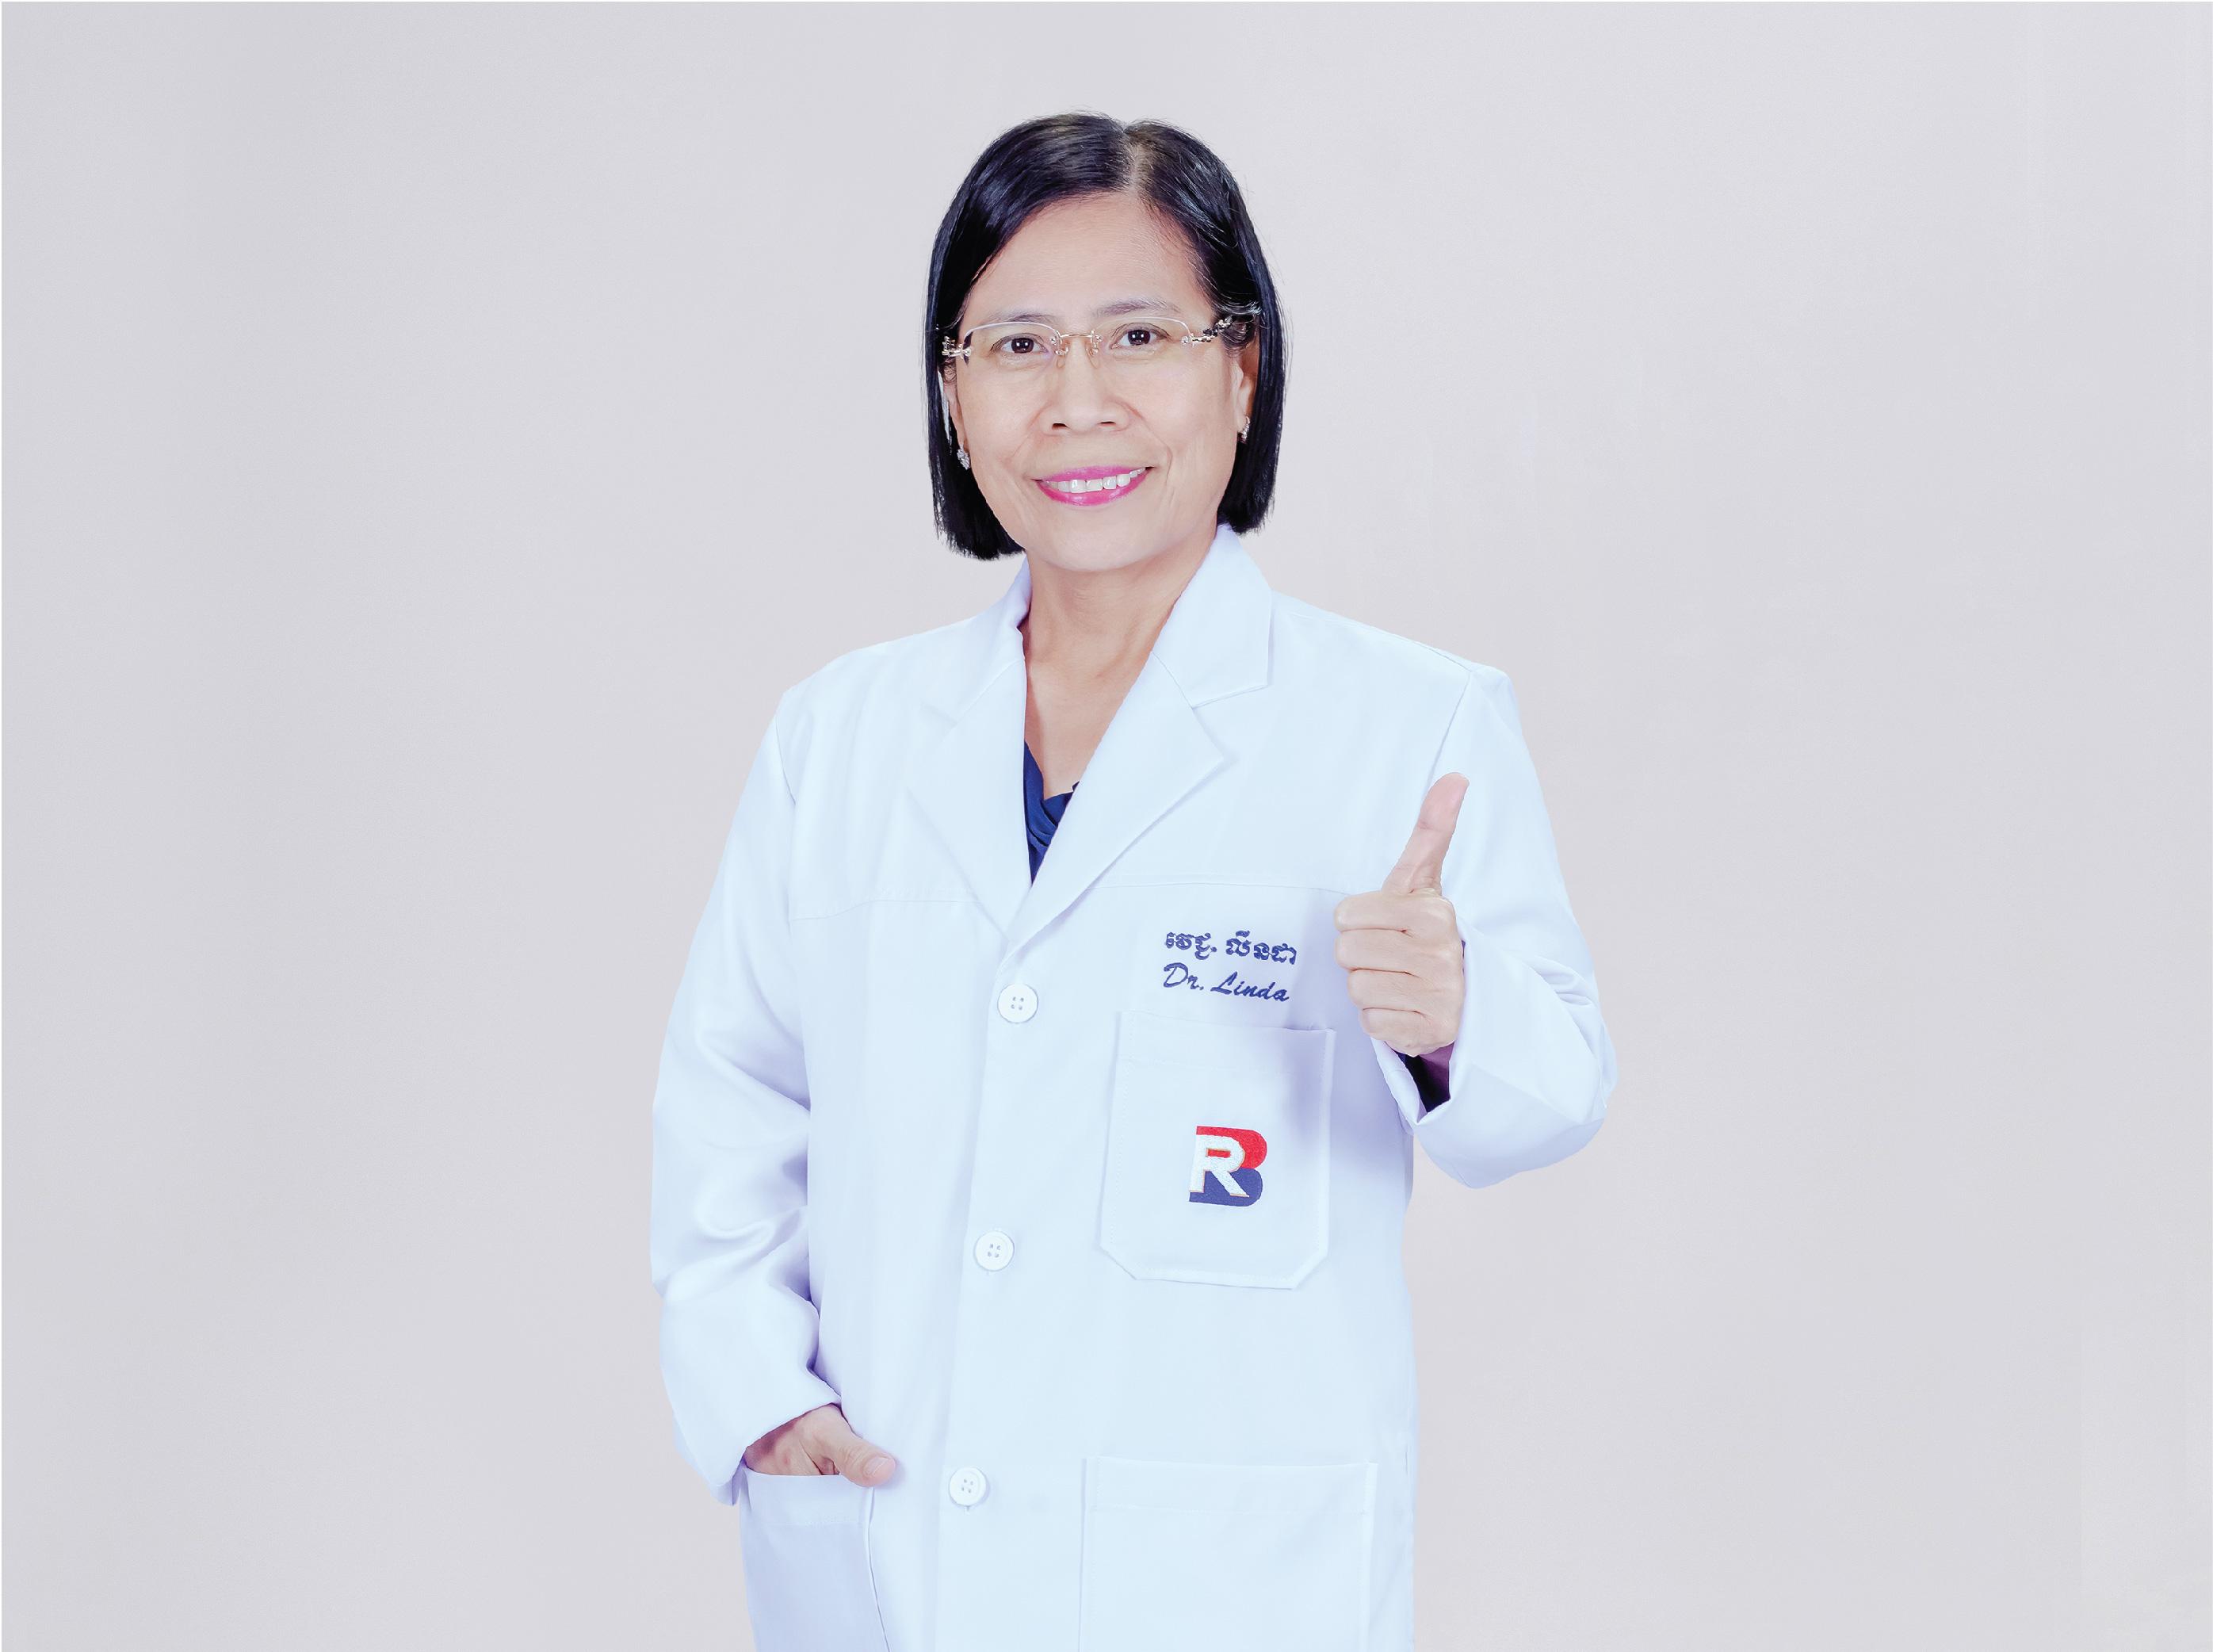 Dr. Linda Ingsrivorakul (TH)